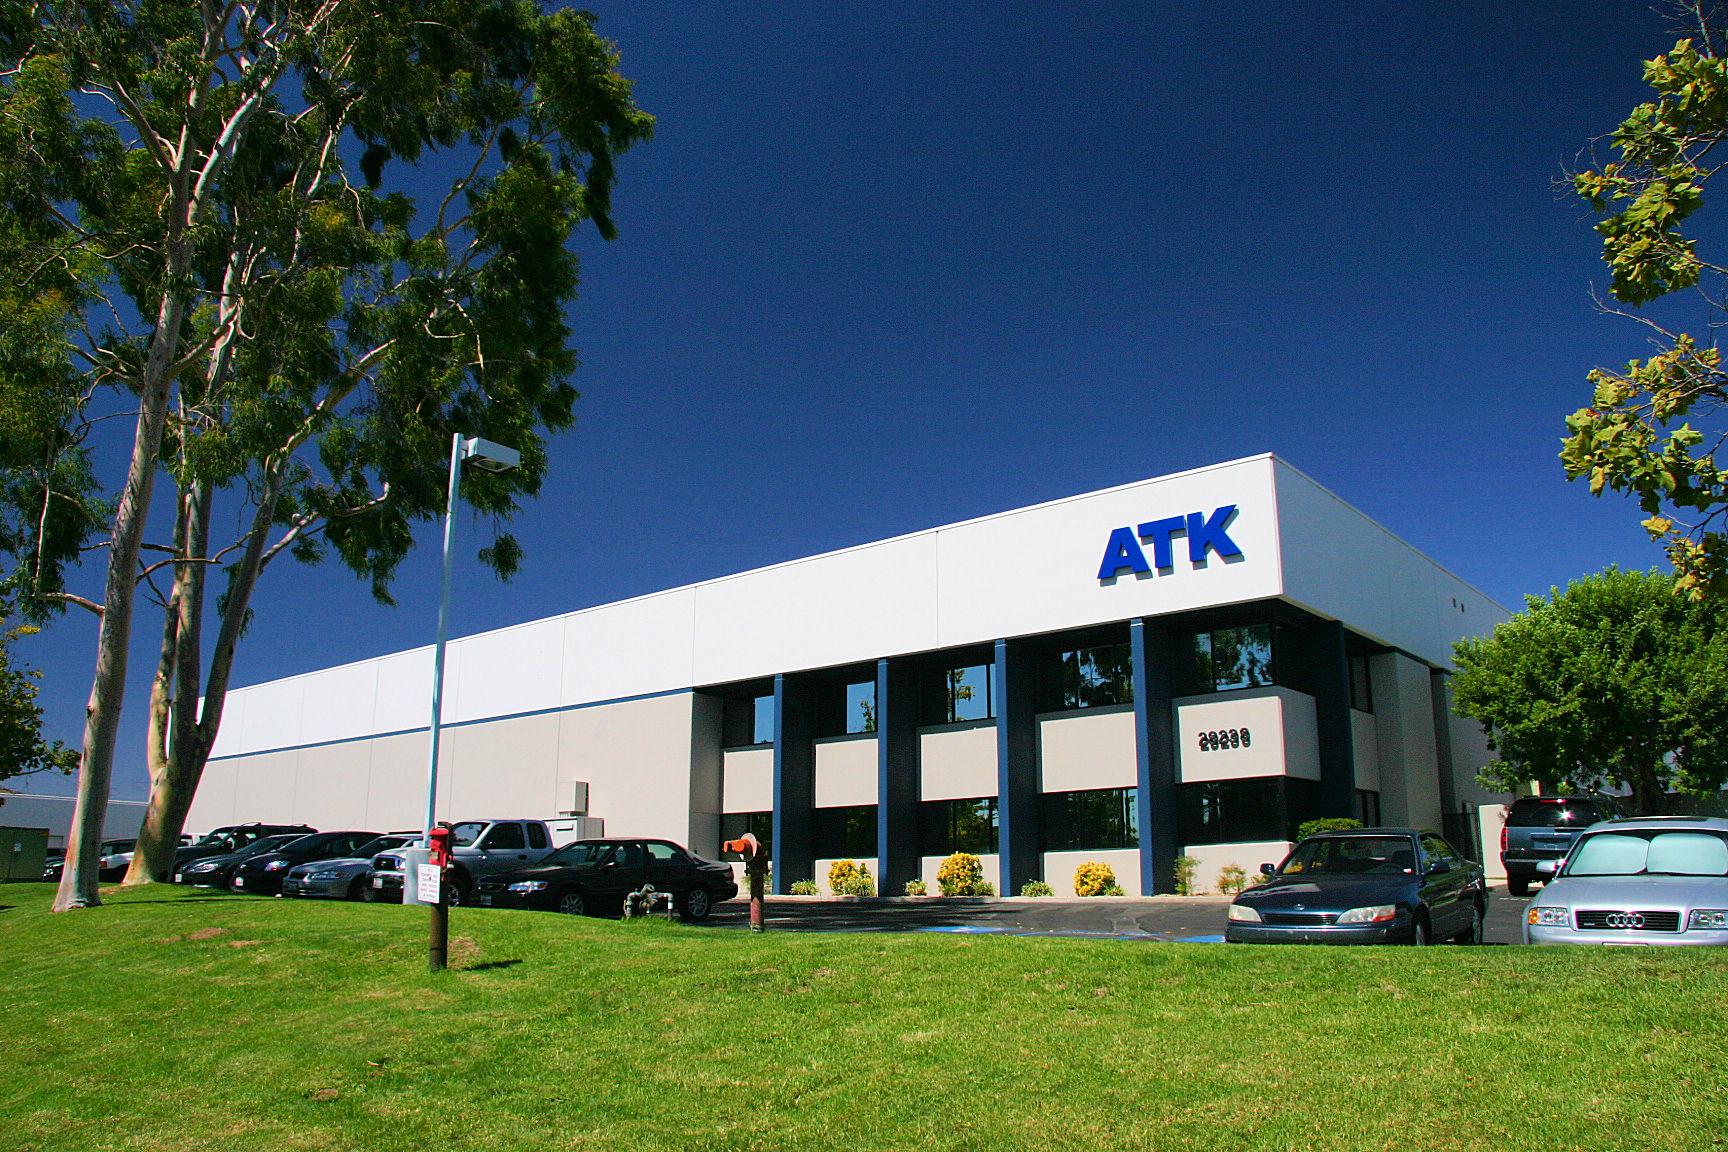 ATK Building